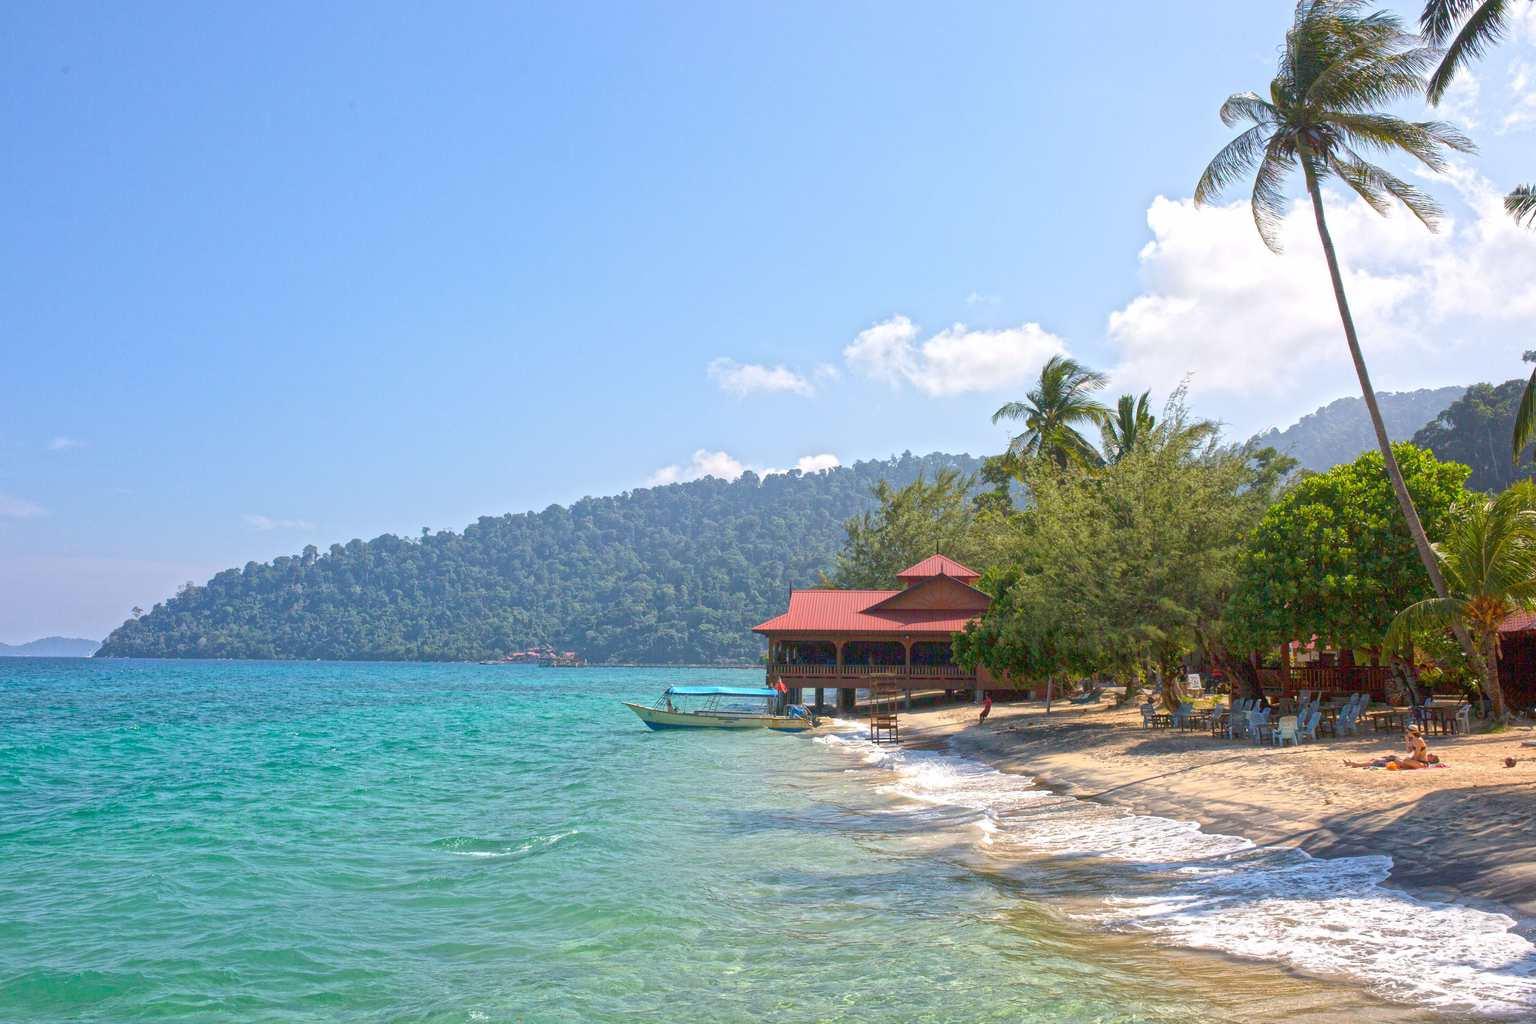 Chilling on Tioman Island